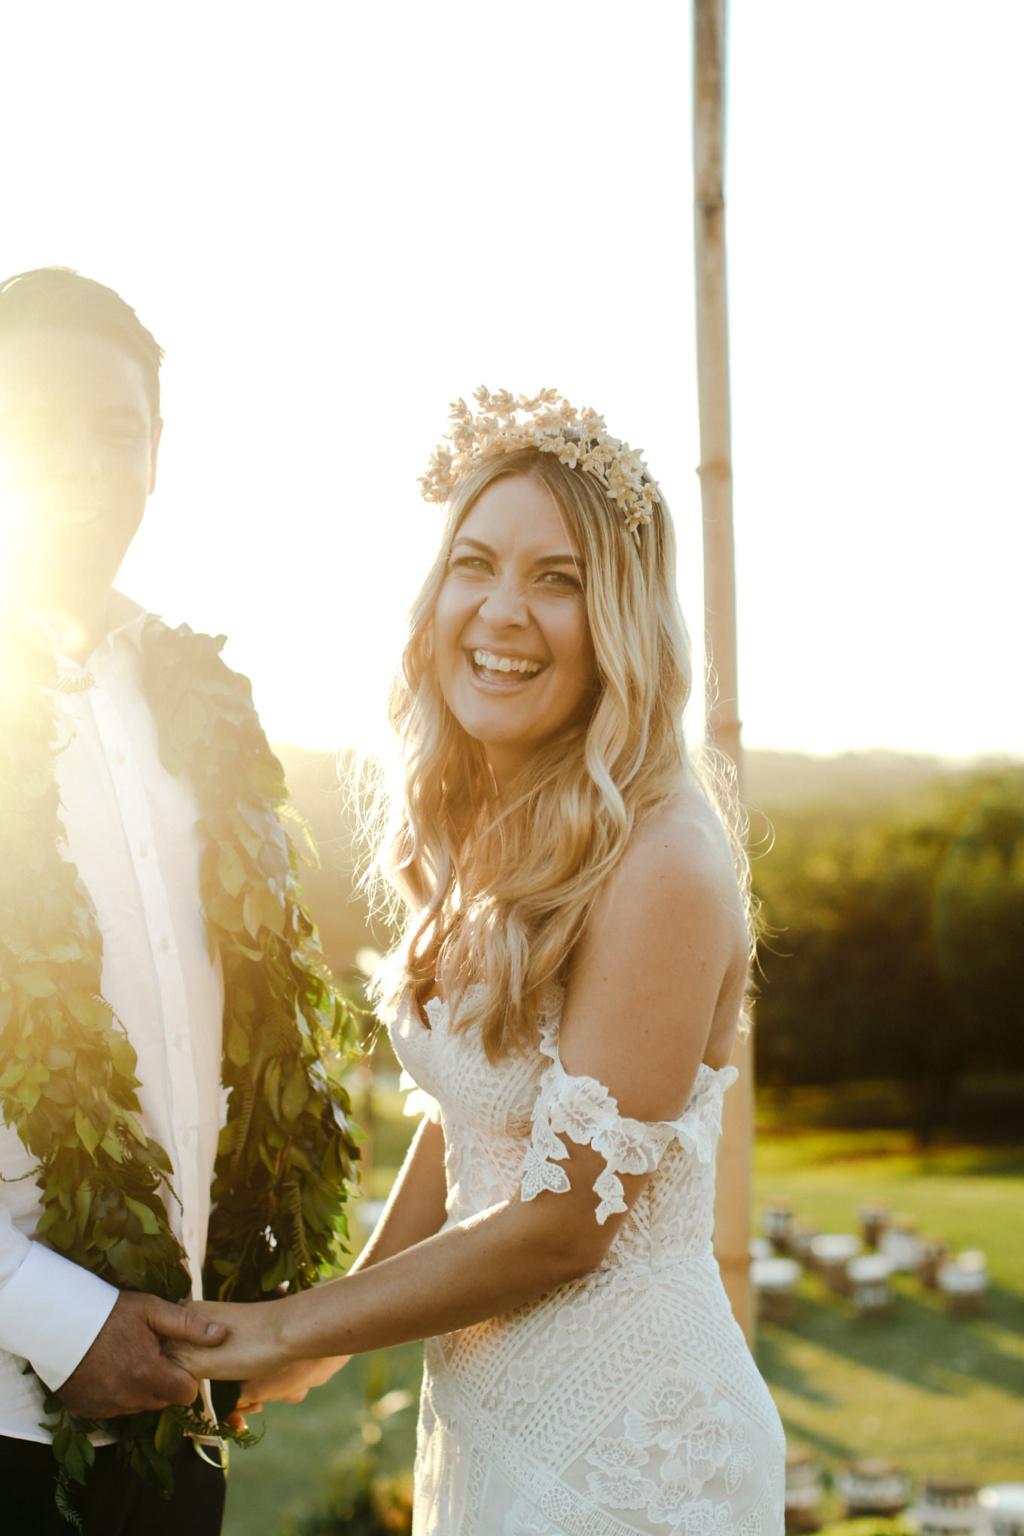 Babyanything-Wedding-Lucie-Ferguson-Rory-Atlantic-175-1024x1536.jpg